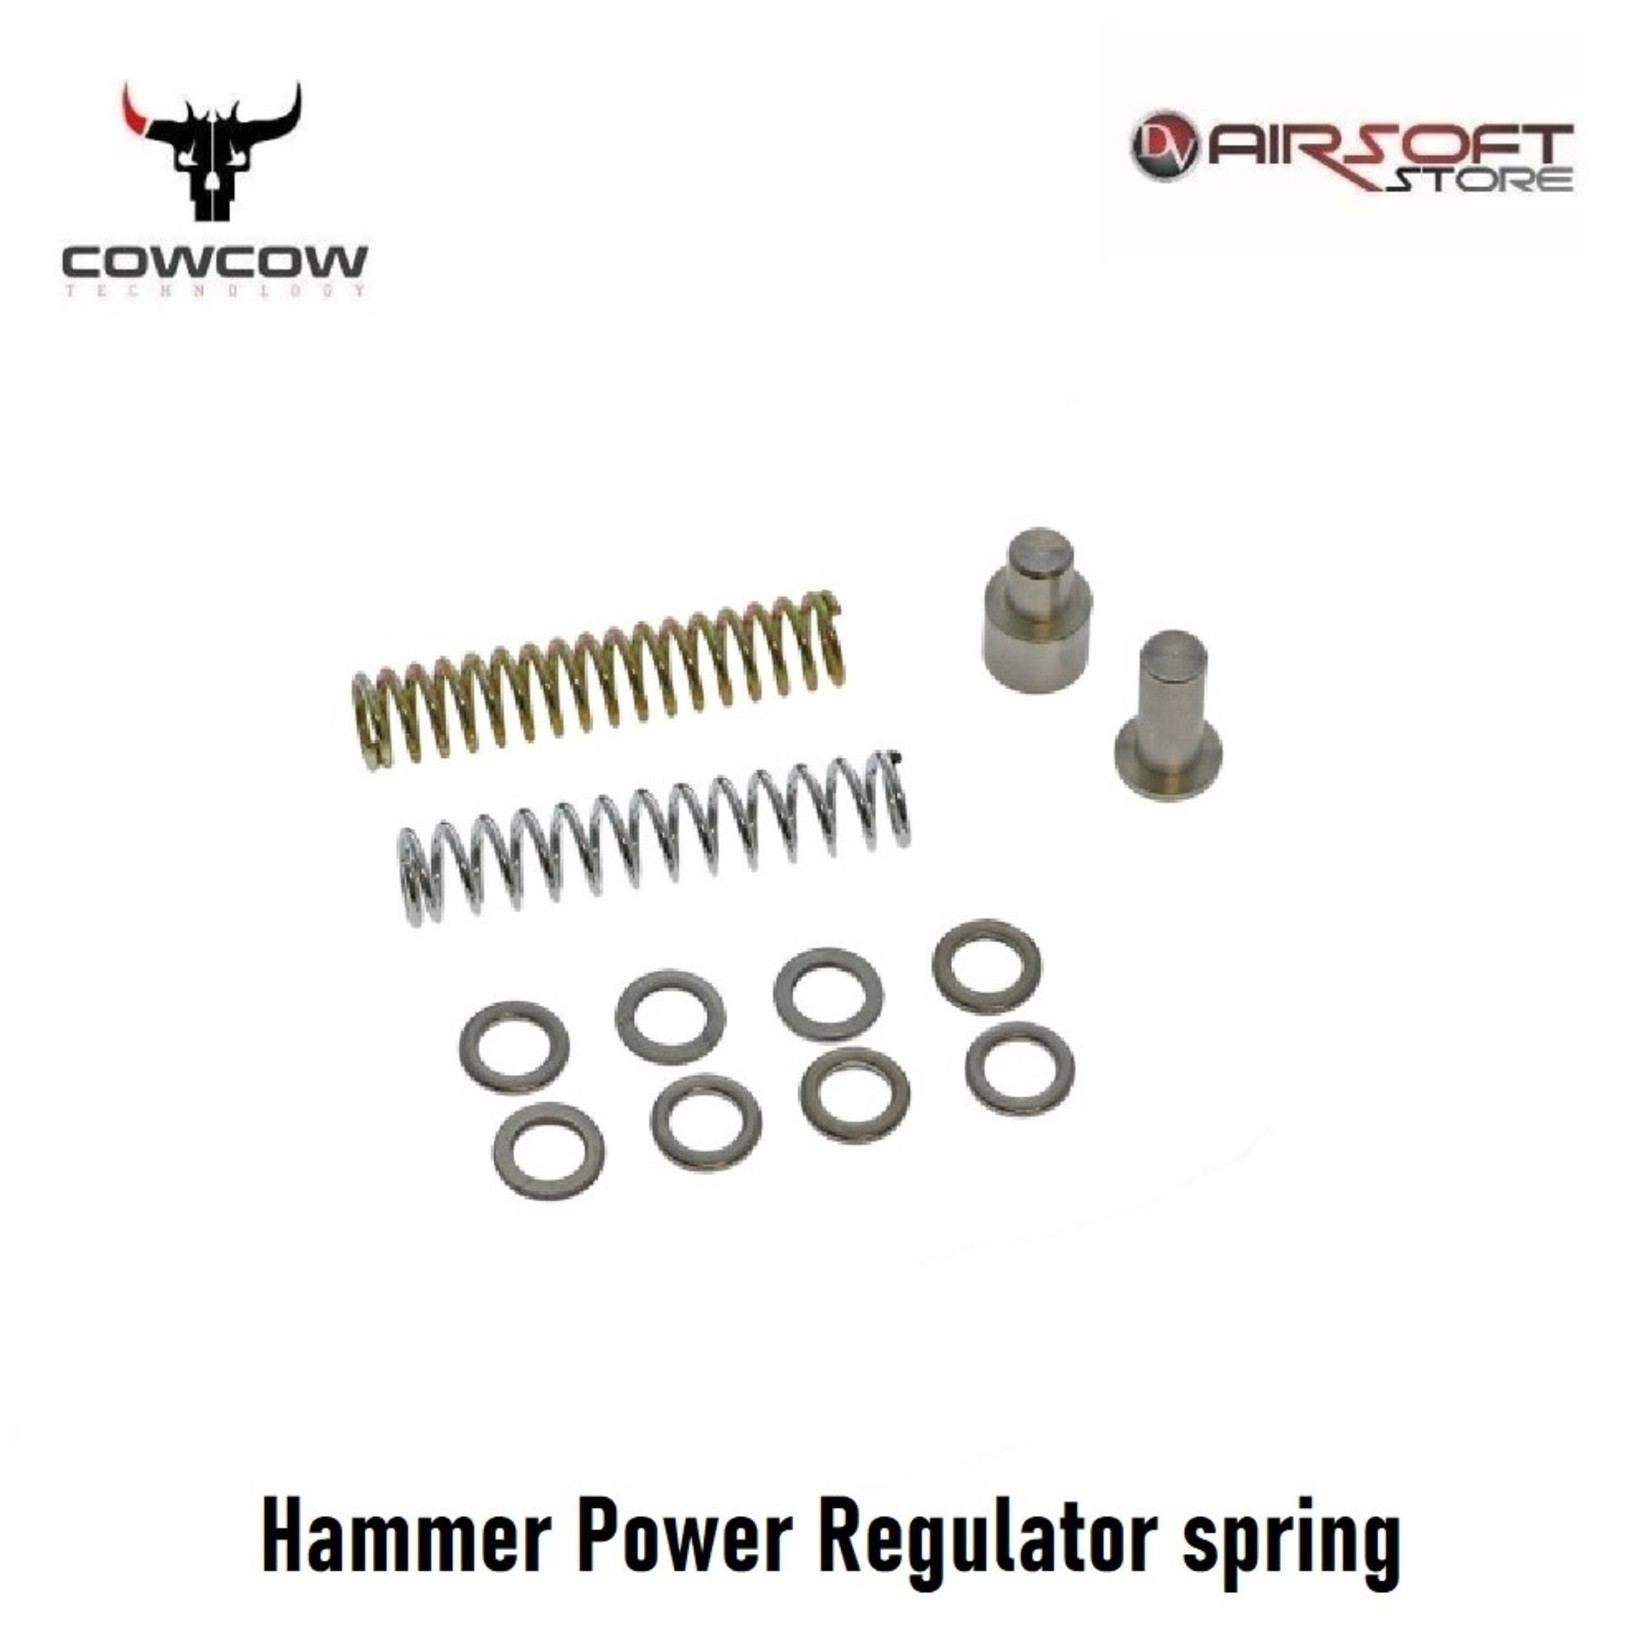 CowCow Hammer Power Regulator spring